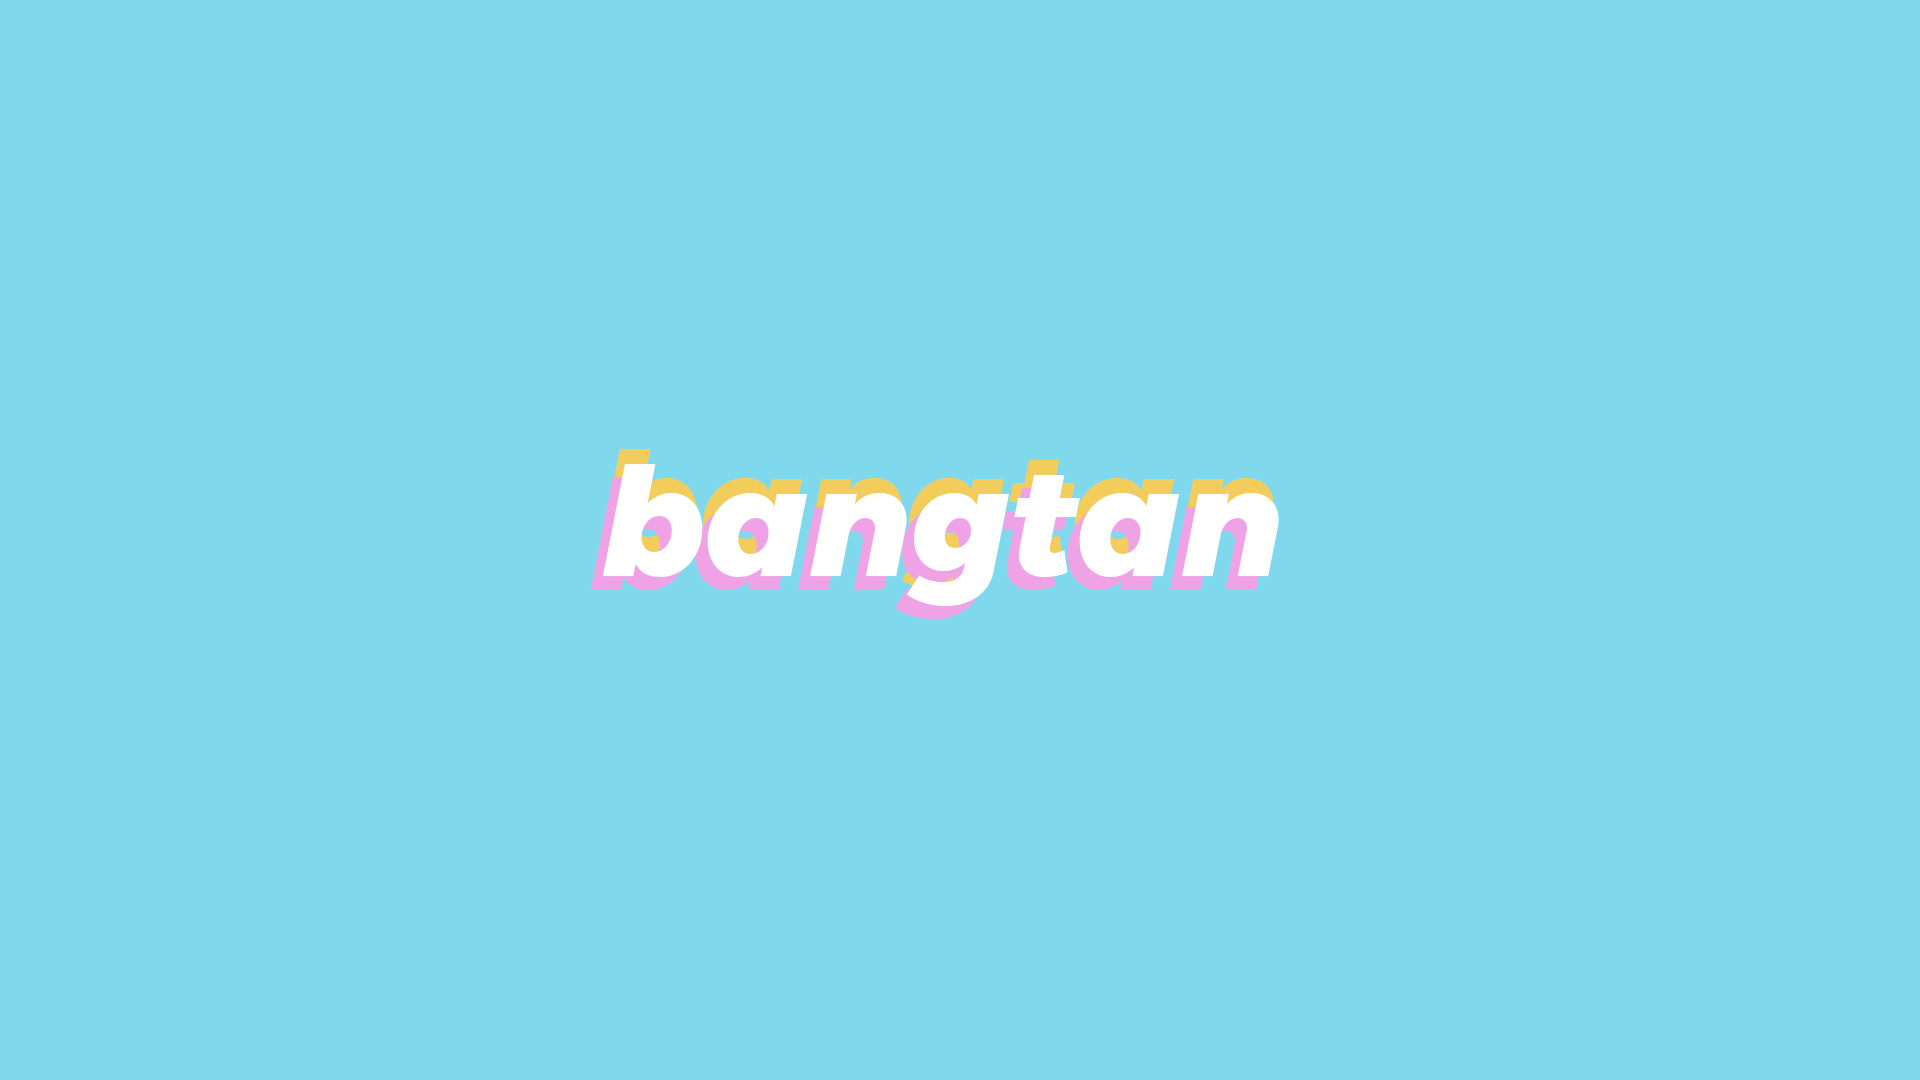 bts bangtan minimalist desktop wallpaper HD 1920 x 1080 bts